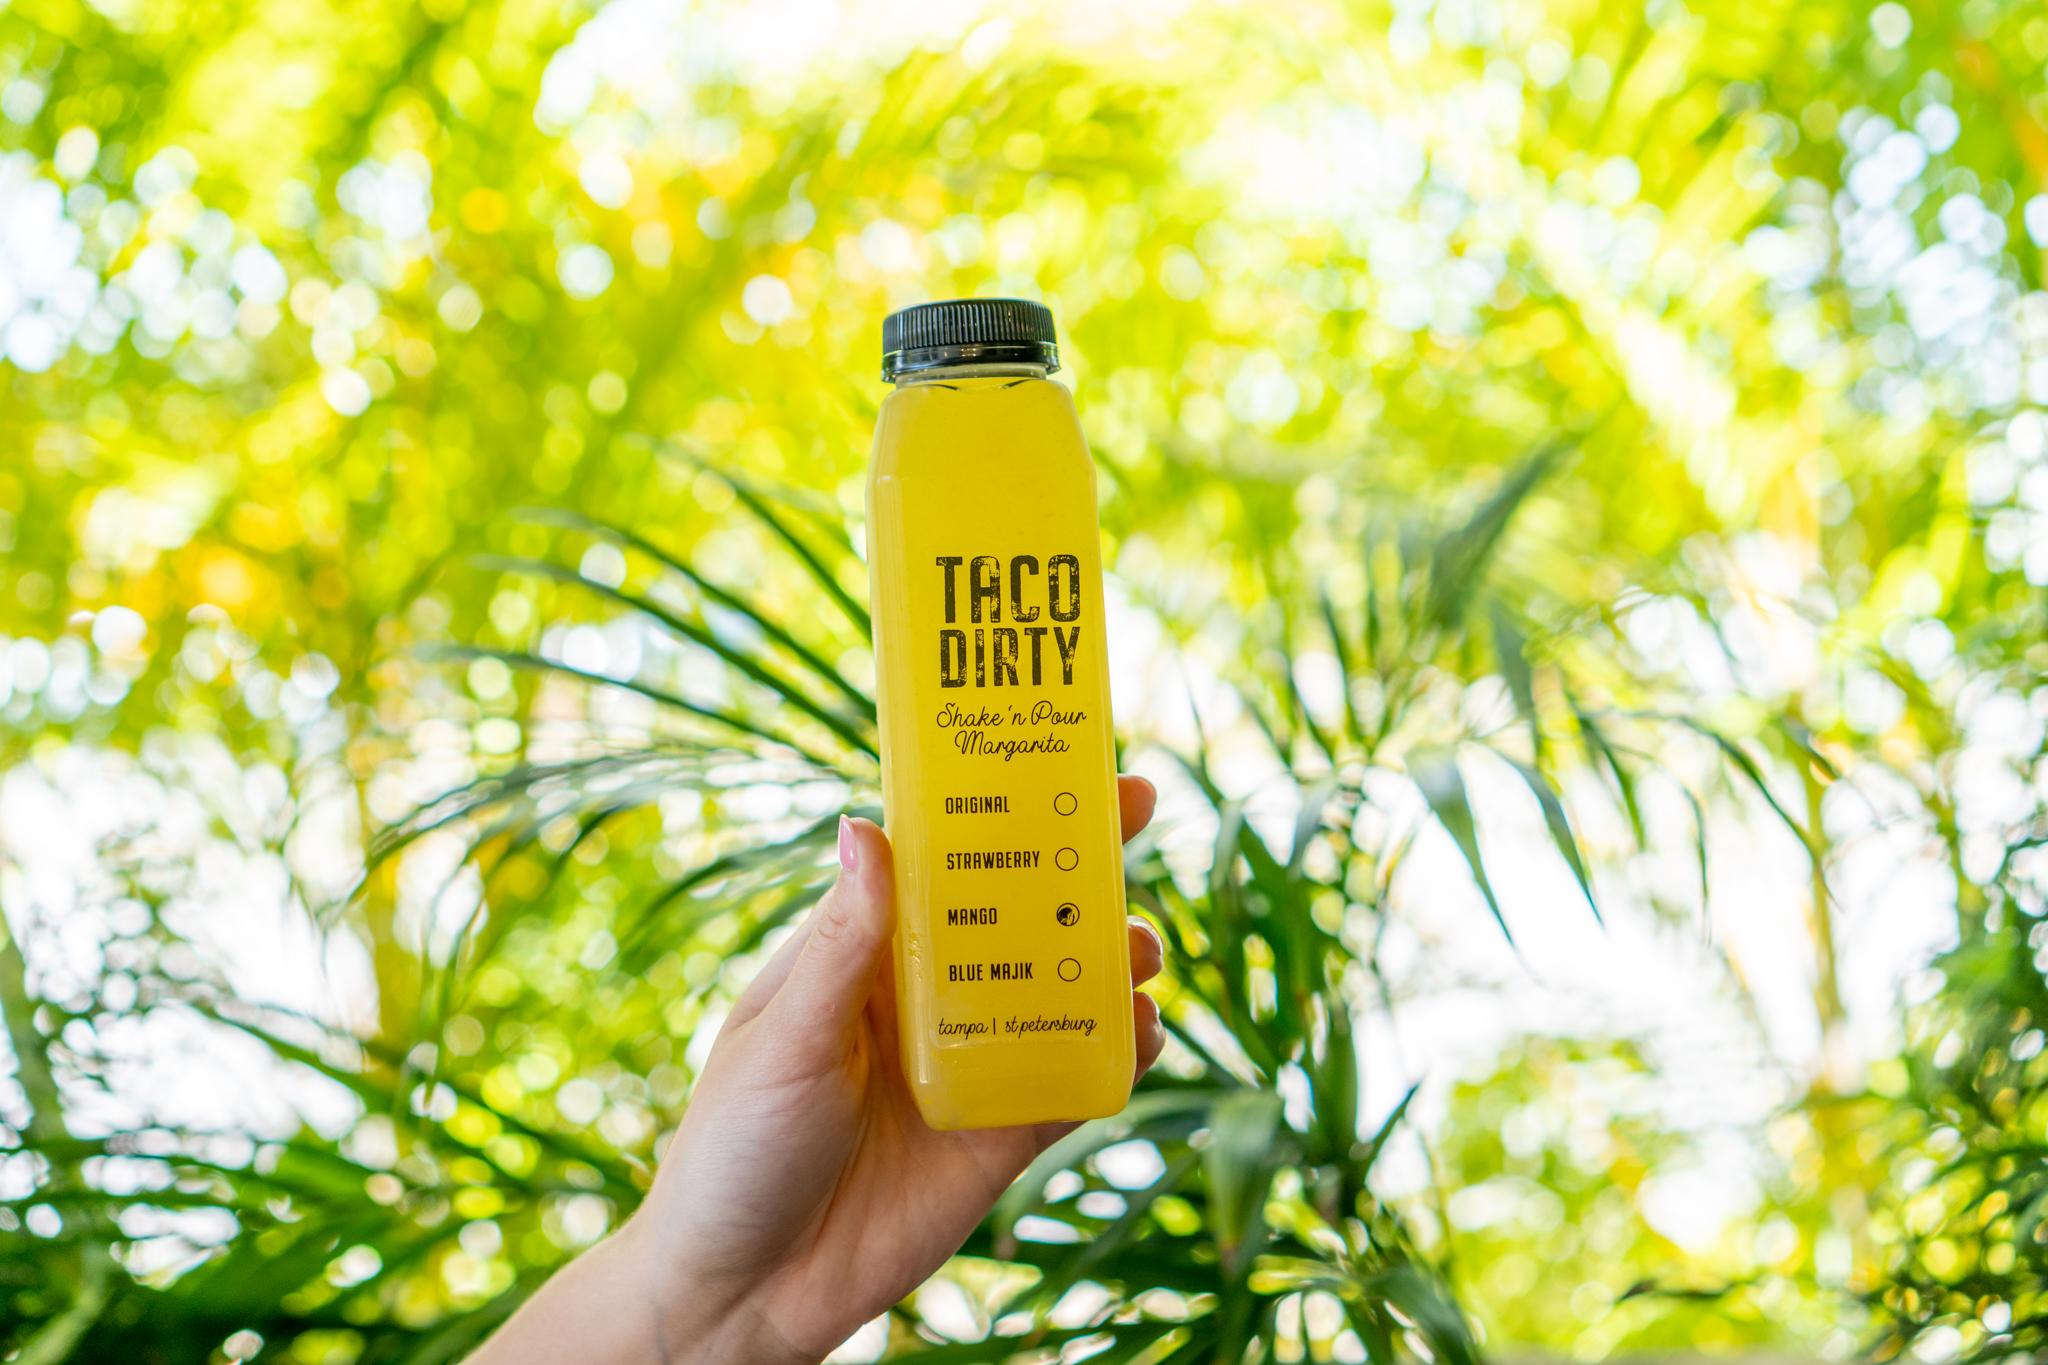 On The Fly Taco Dirty Mango Margarita